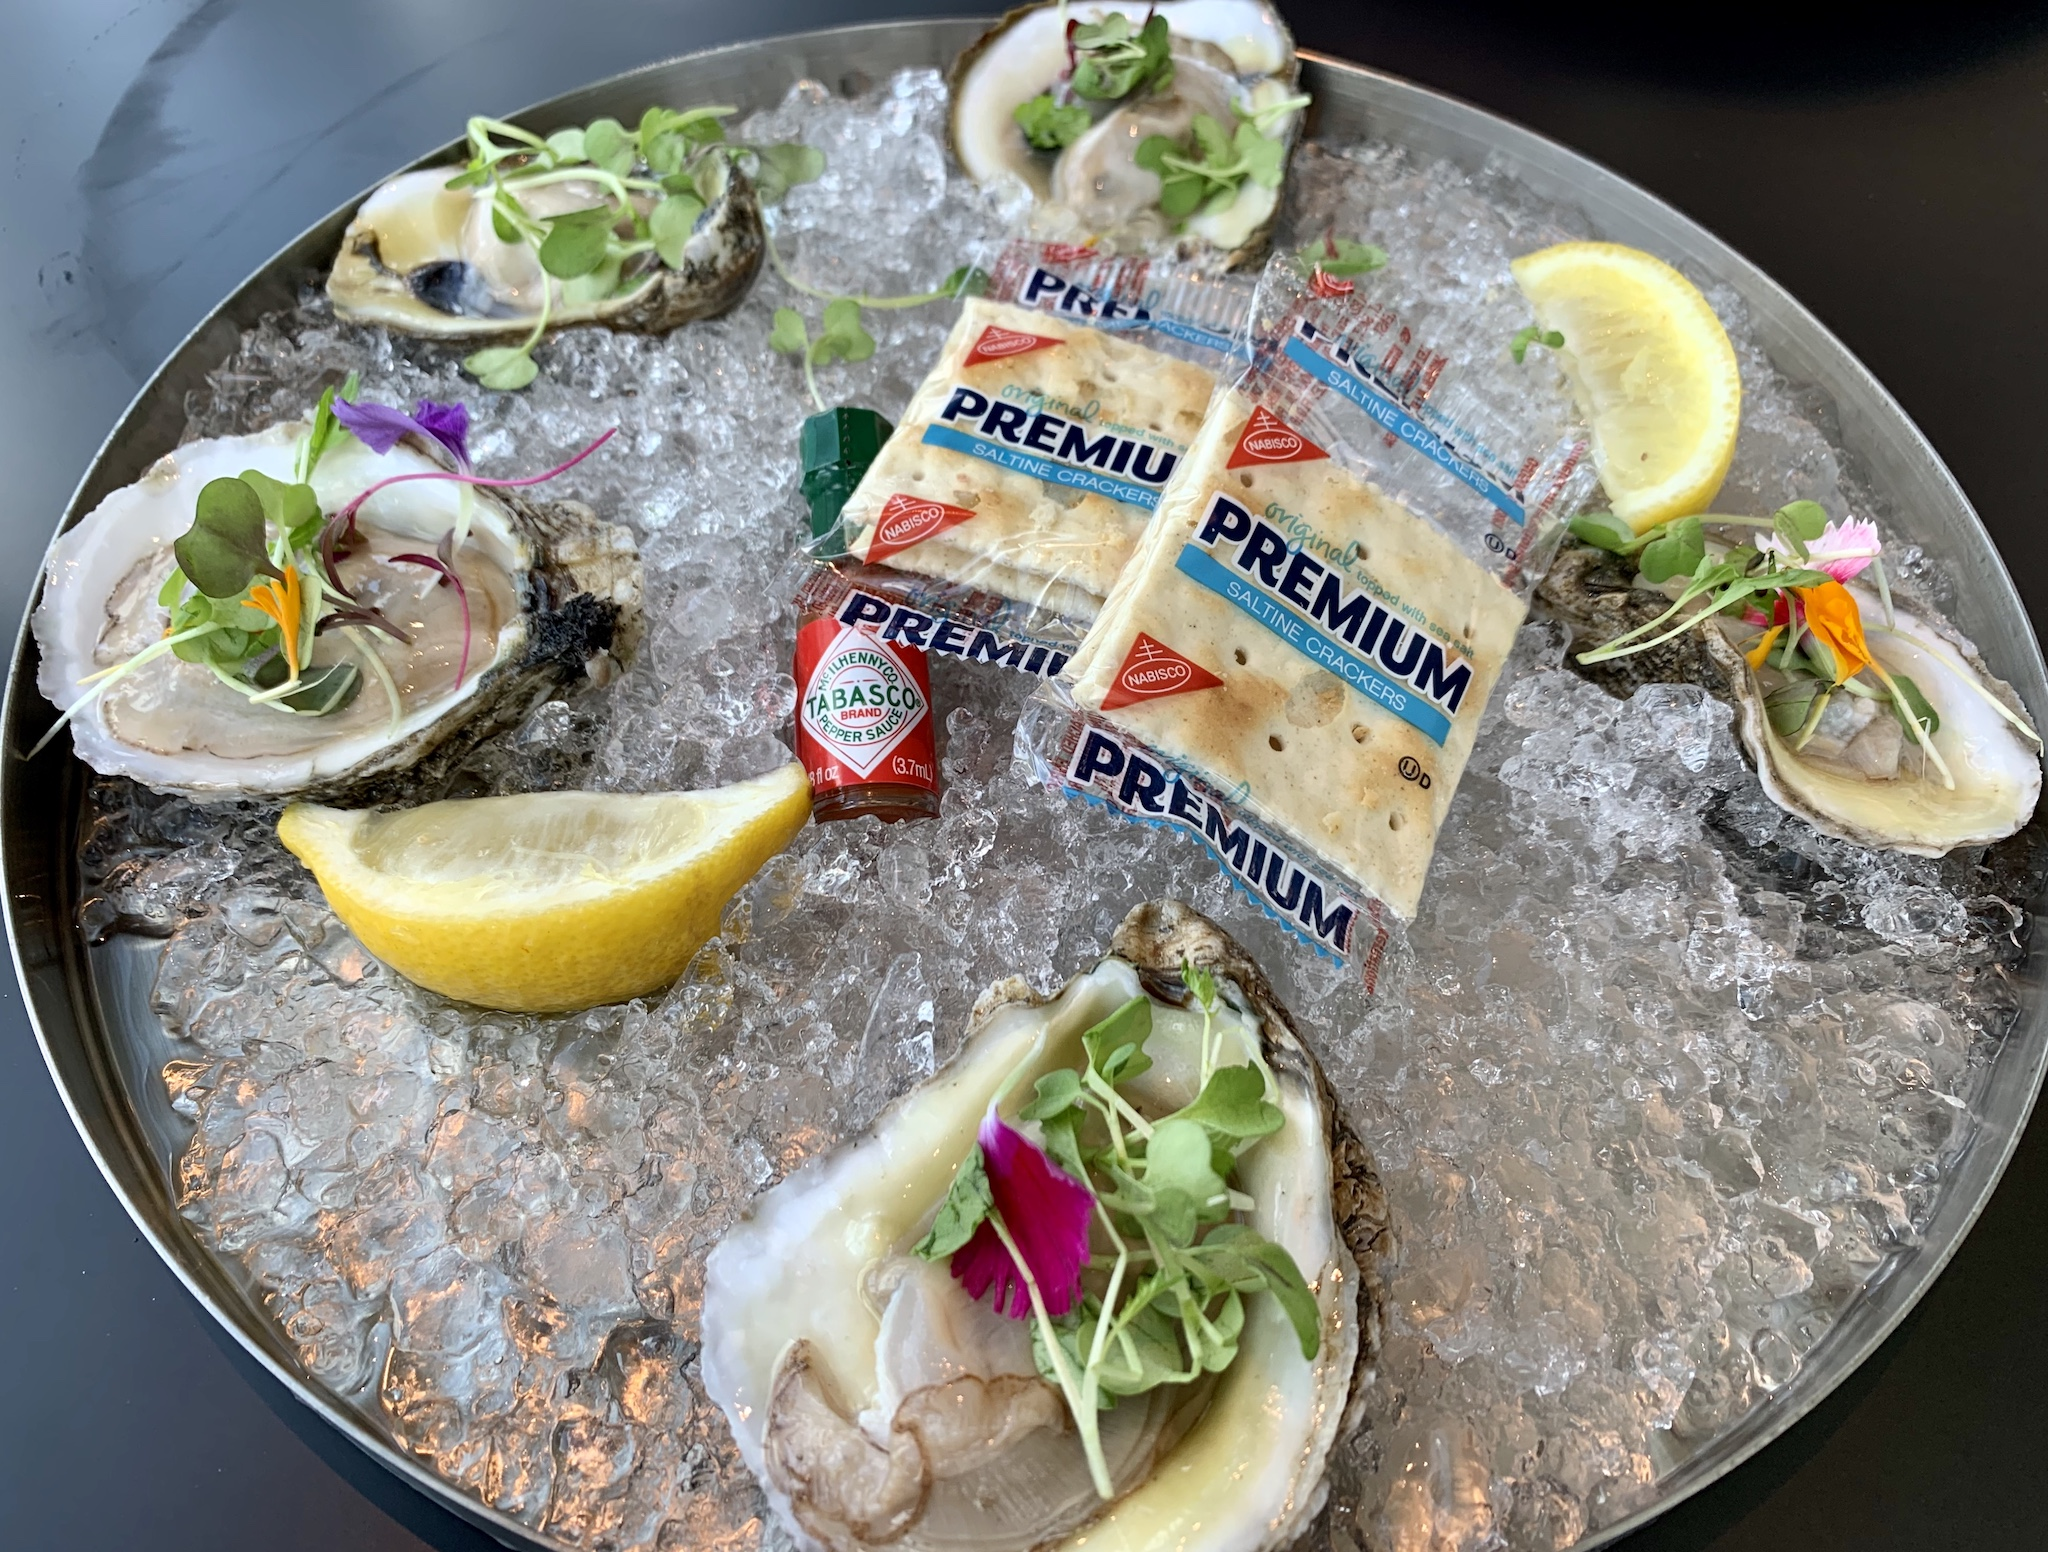 Teak Featured Shucked Oyster - saltines, mini Tabasco, lemons, classic cocktail sauce